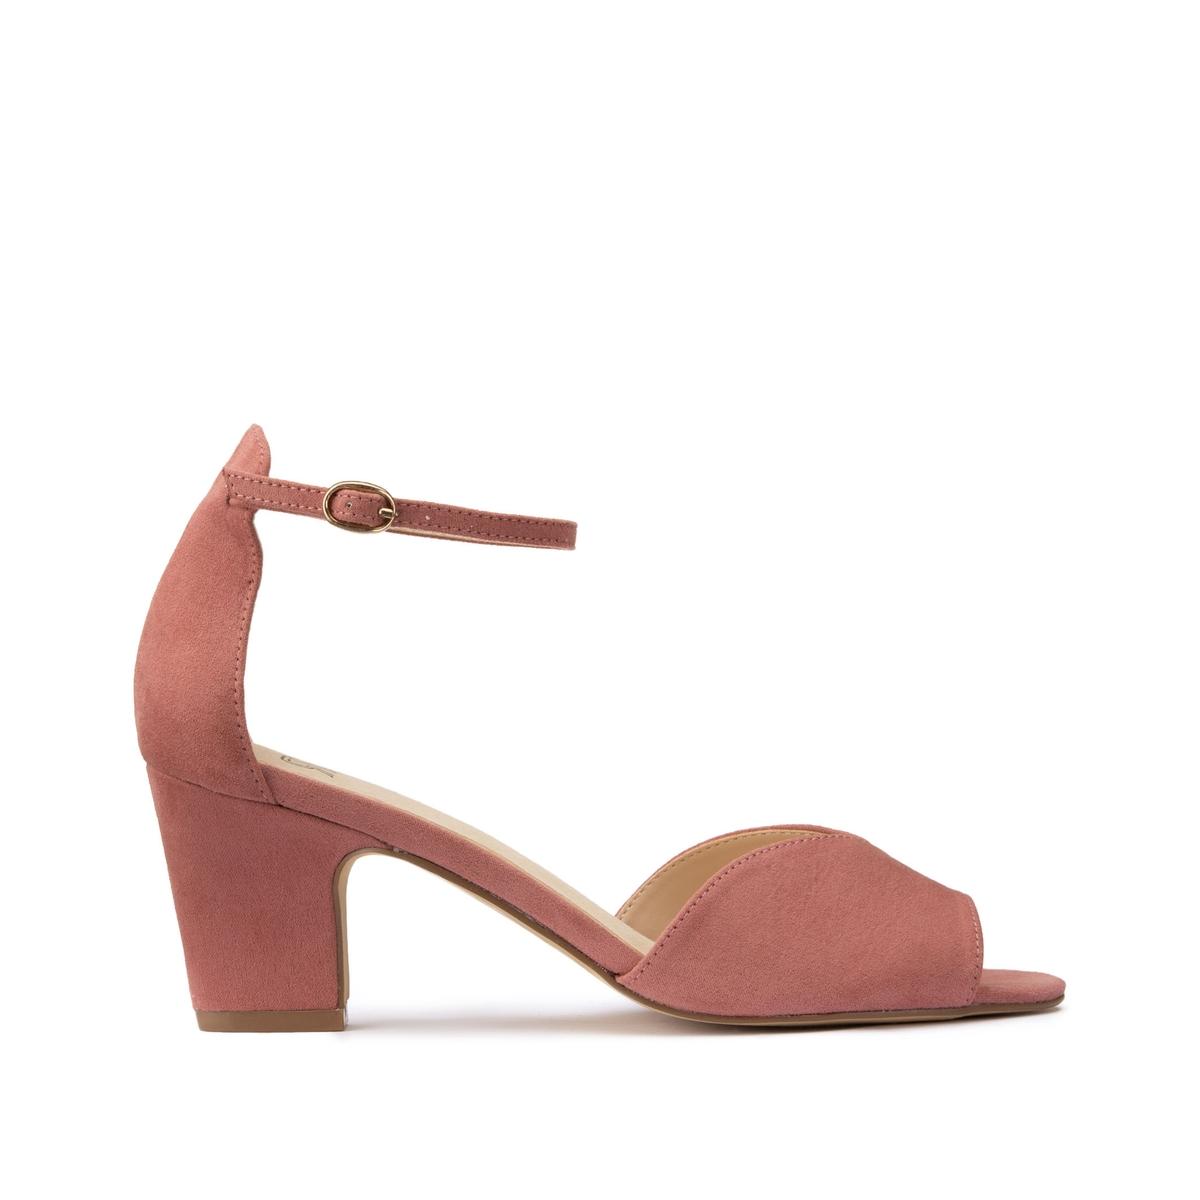 цена Босоножки La Redoute С ремешком на среднем каблуке 41 розовый онлайн в 2017 году